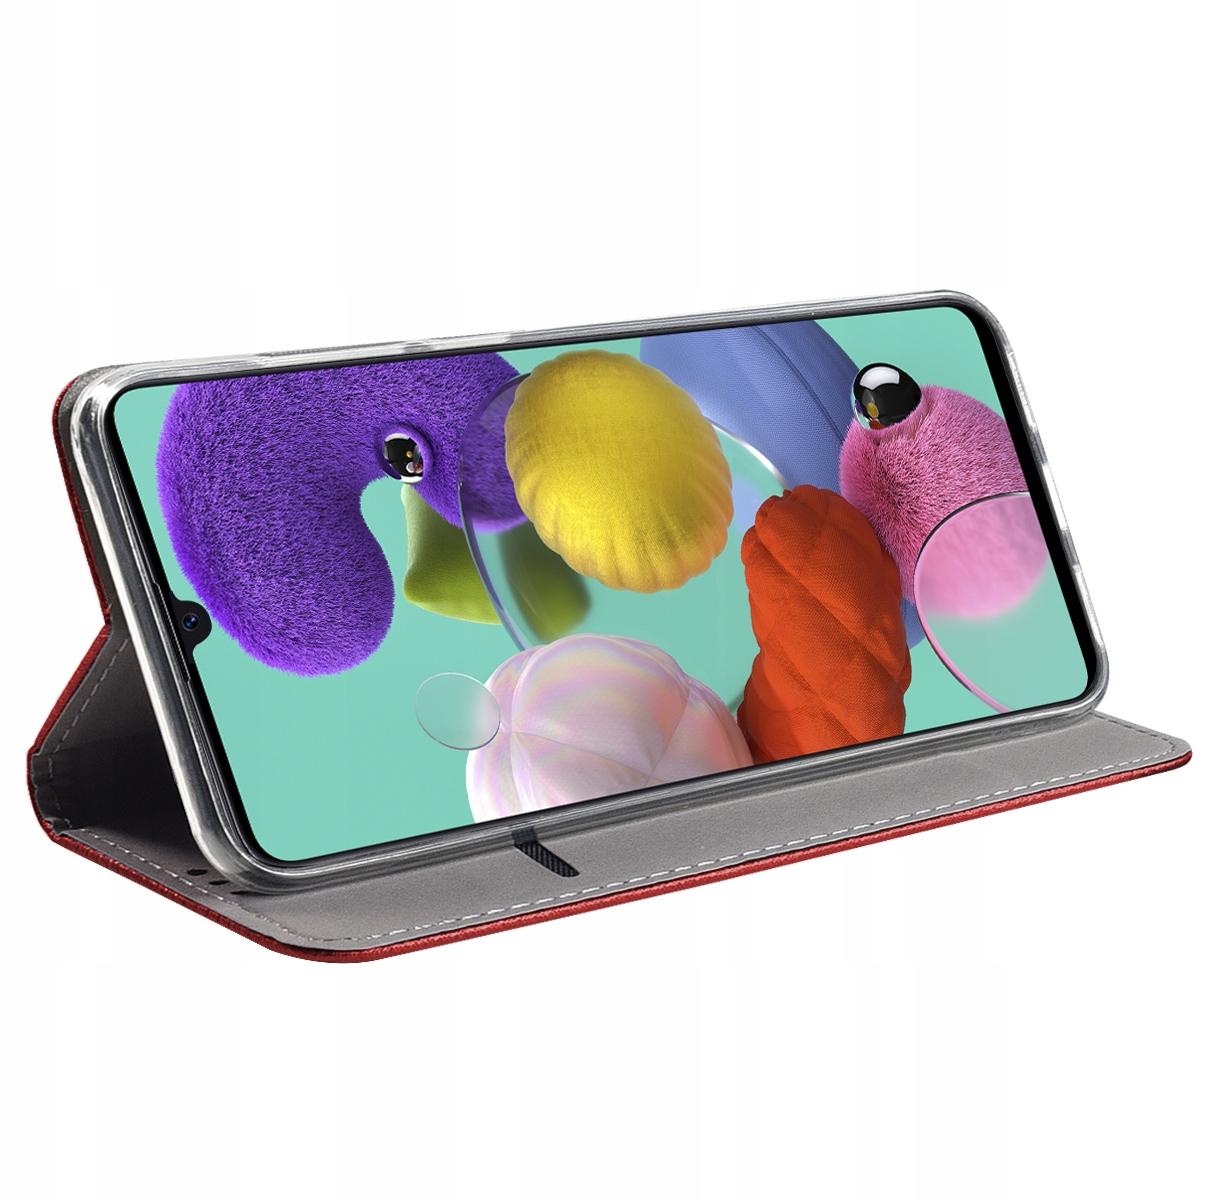 Etui do Motorola Moto G9 Play Case Magnet + Szkło Kod producenta N50